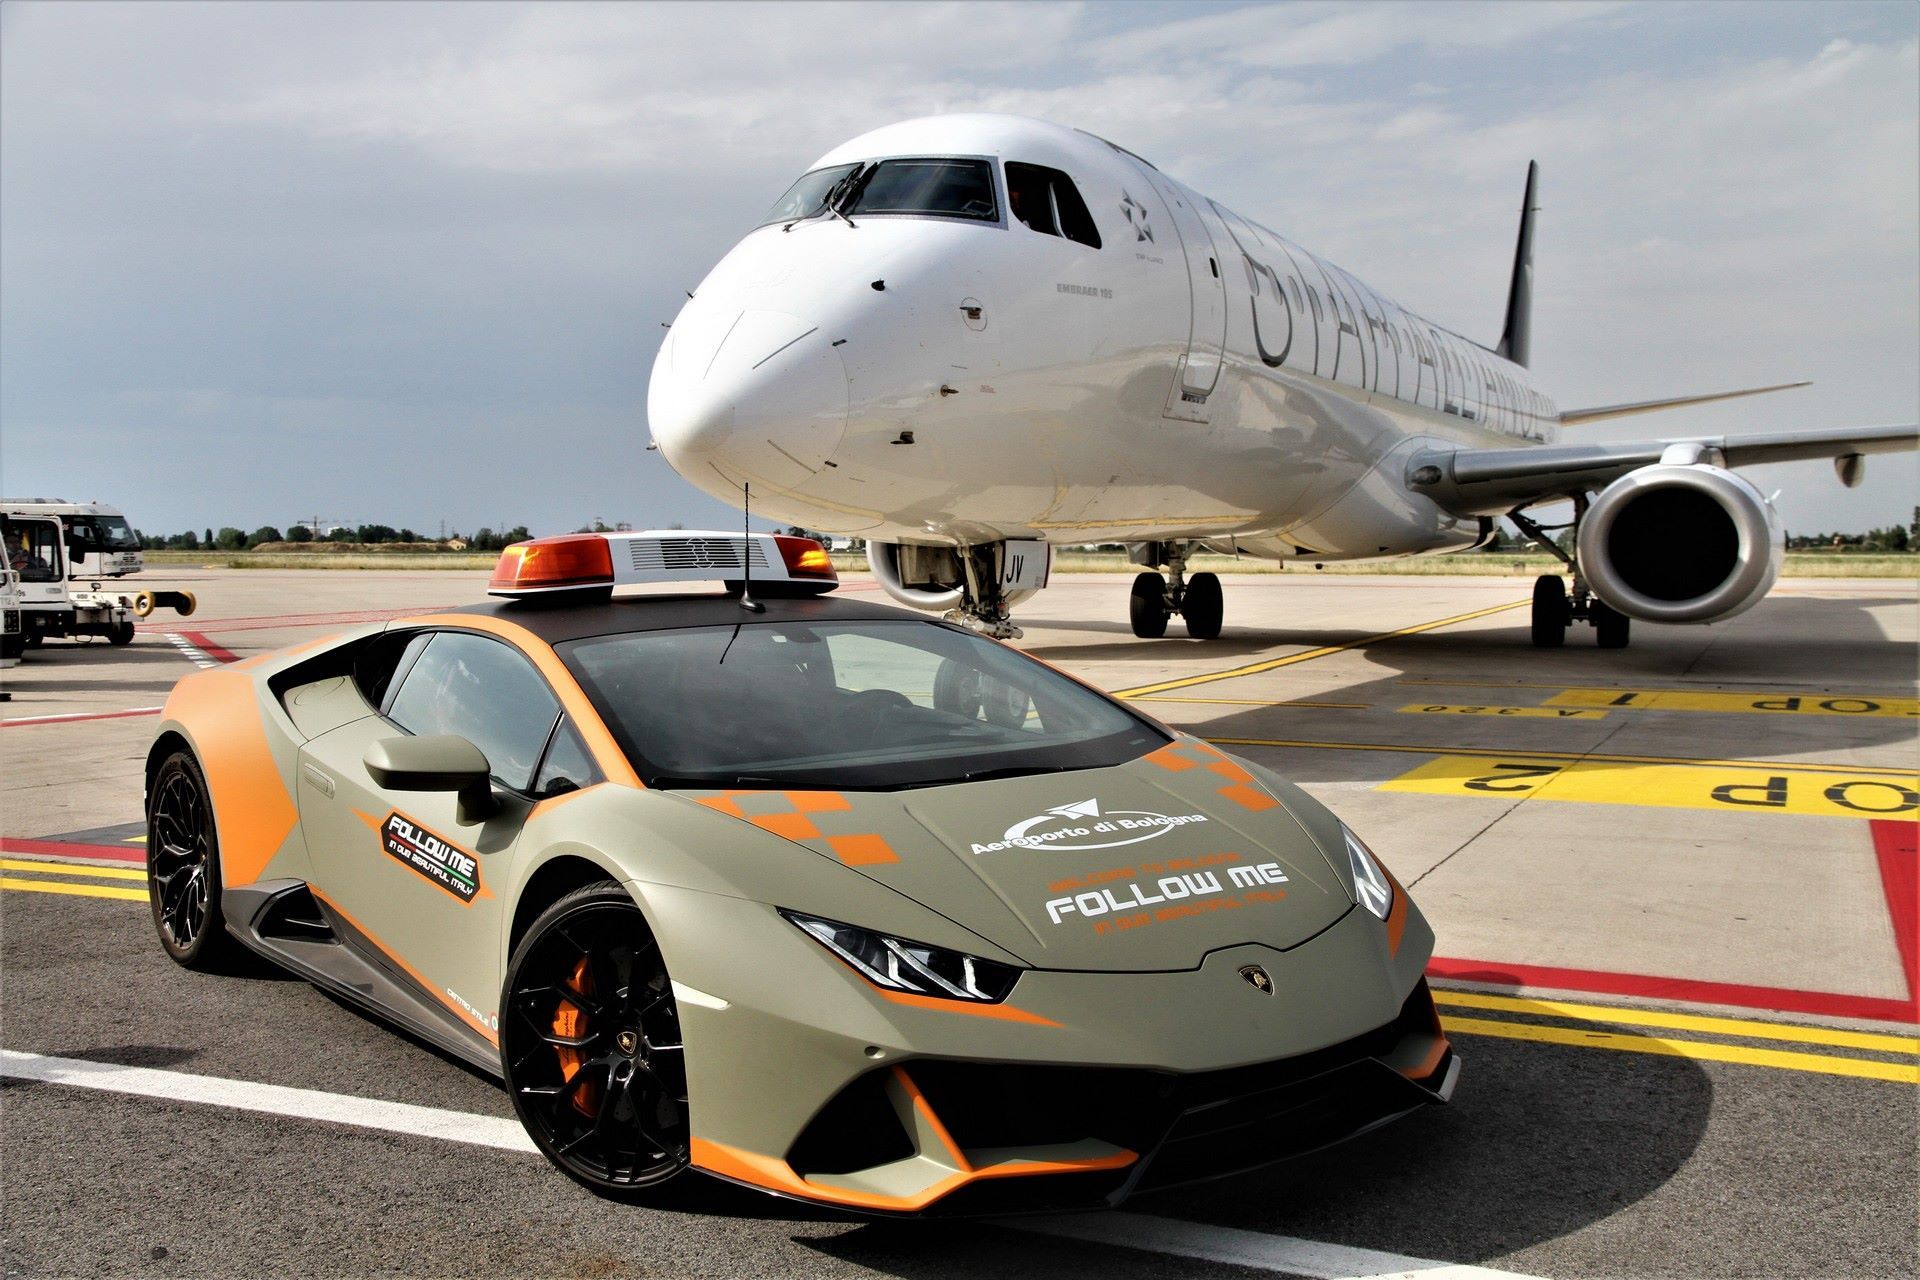 Lamborghini-Huracan-Evo-Follow-Me-bologna-airport-2021-13